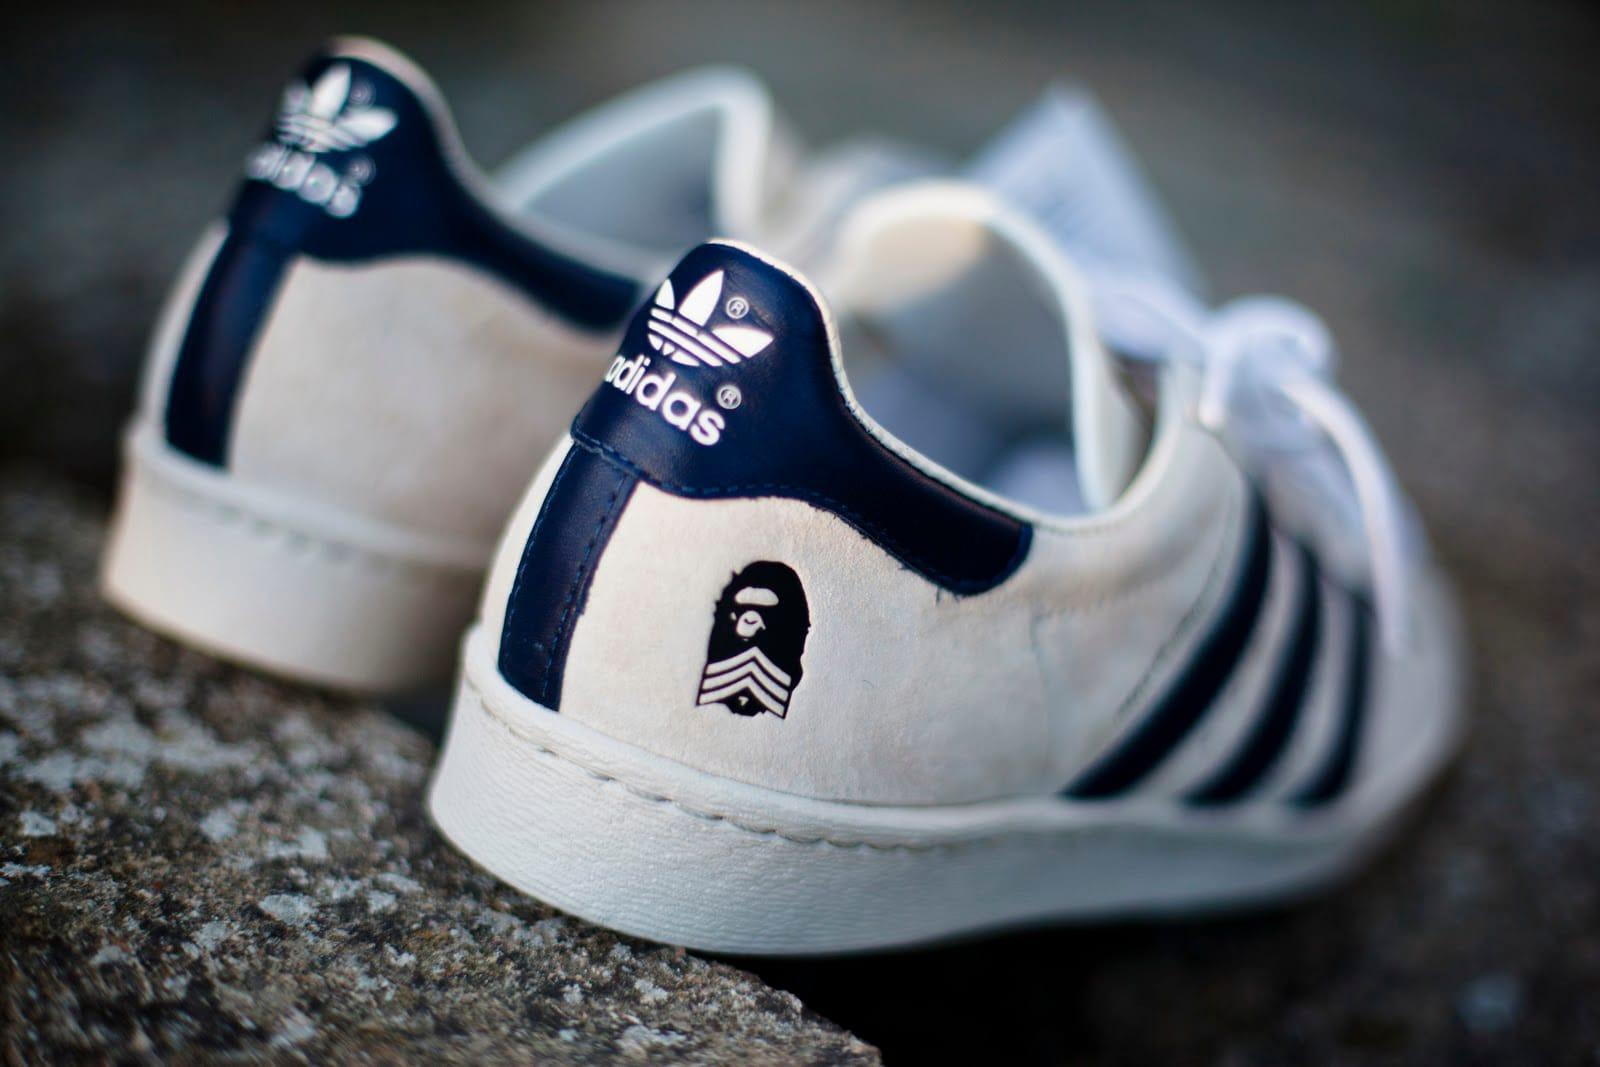 BAPE x adidas Collaborations